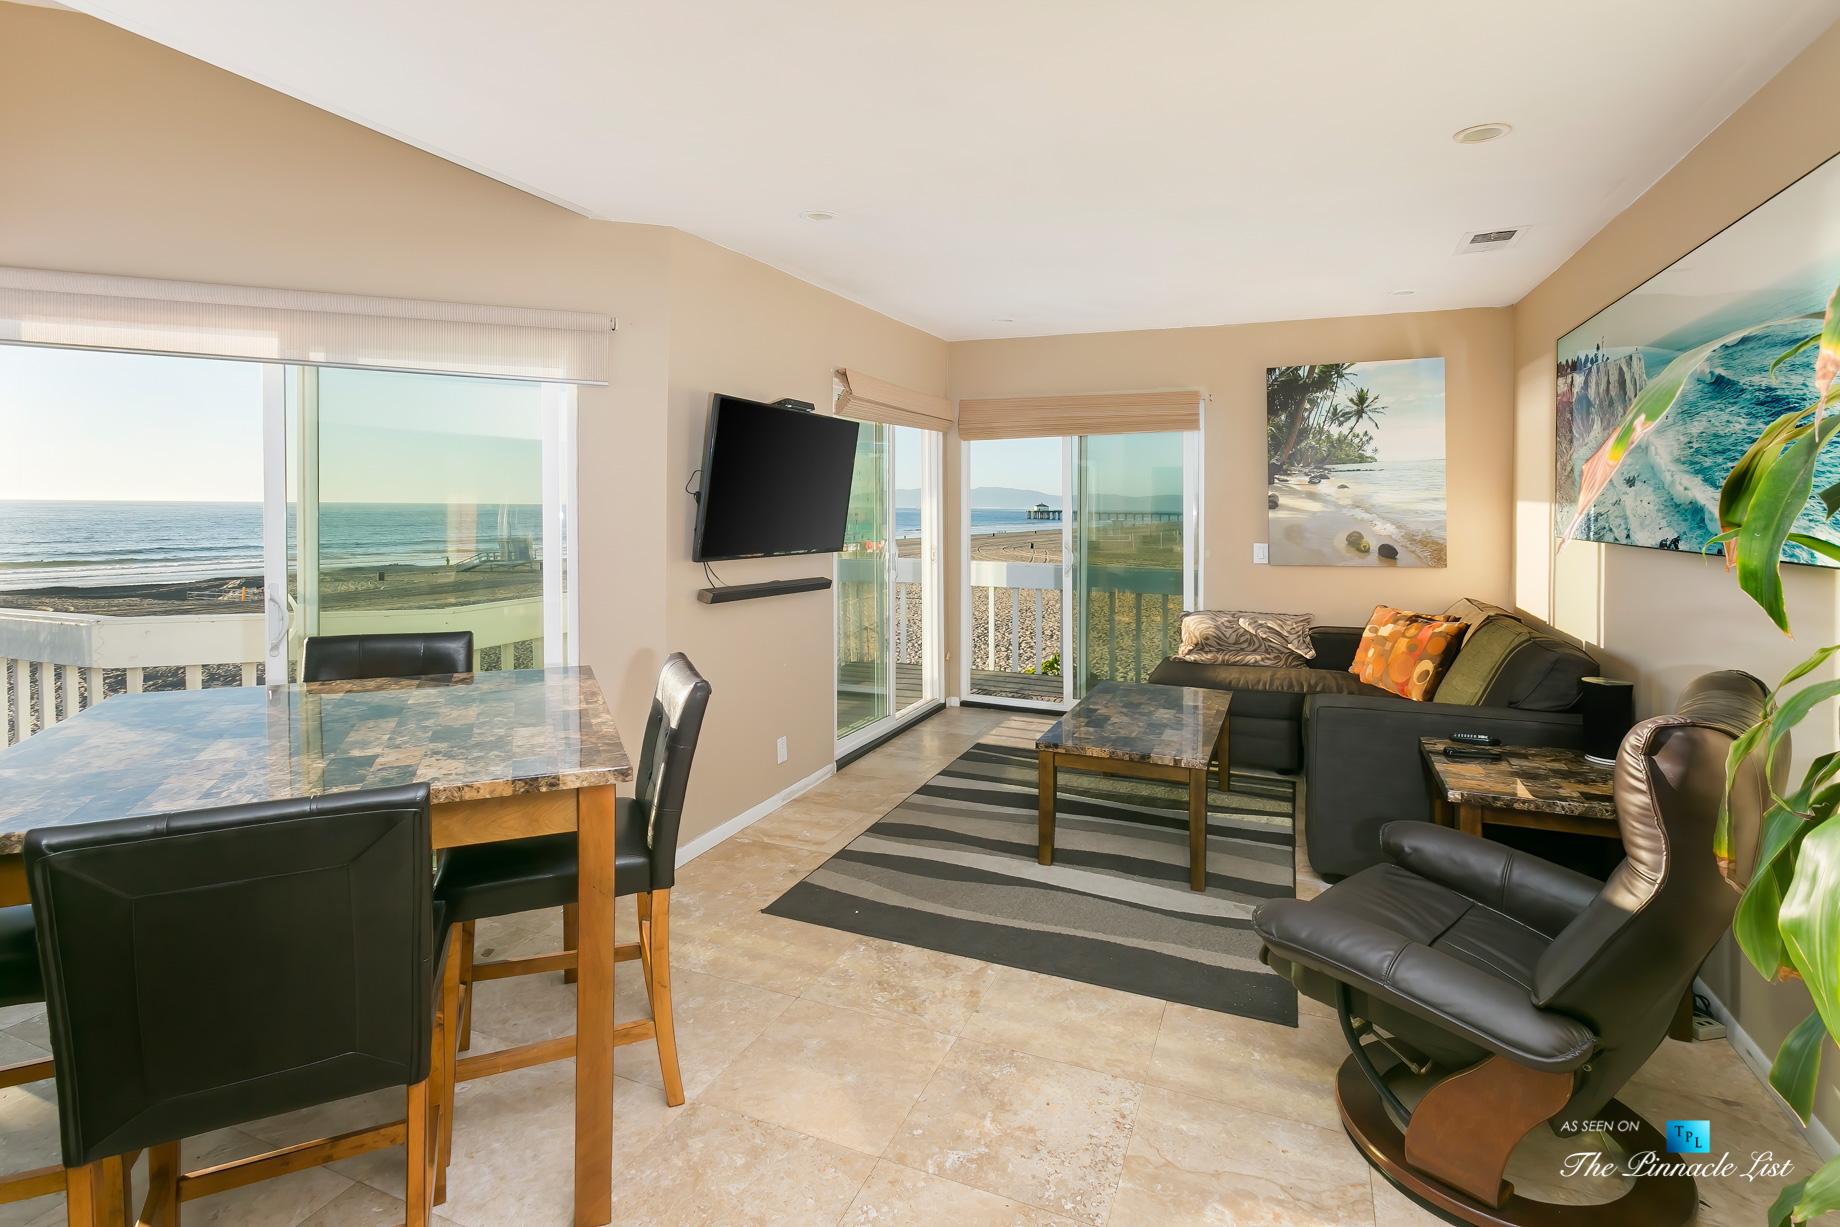 3500 The Strand, Hermosa Beach, CA, USA - Living Room – Luxury Real Estate – Original 90210 Beach House - Oceanfront Home